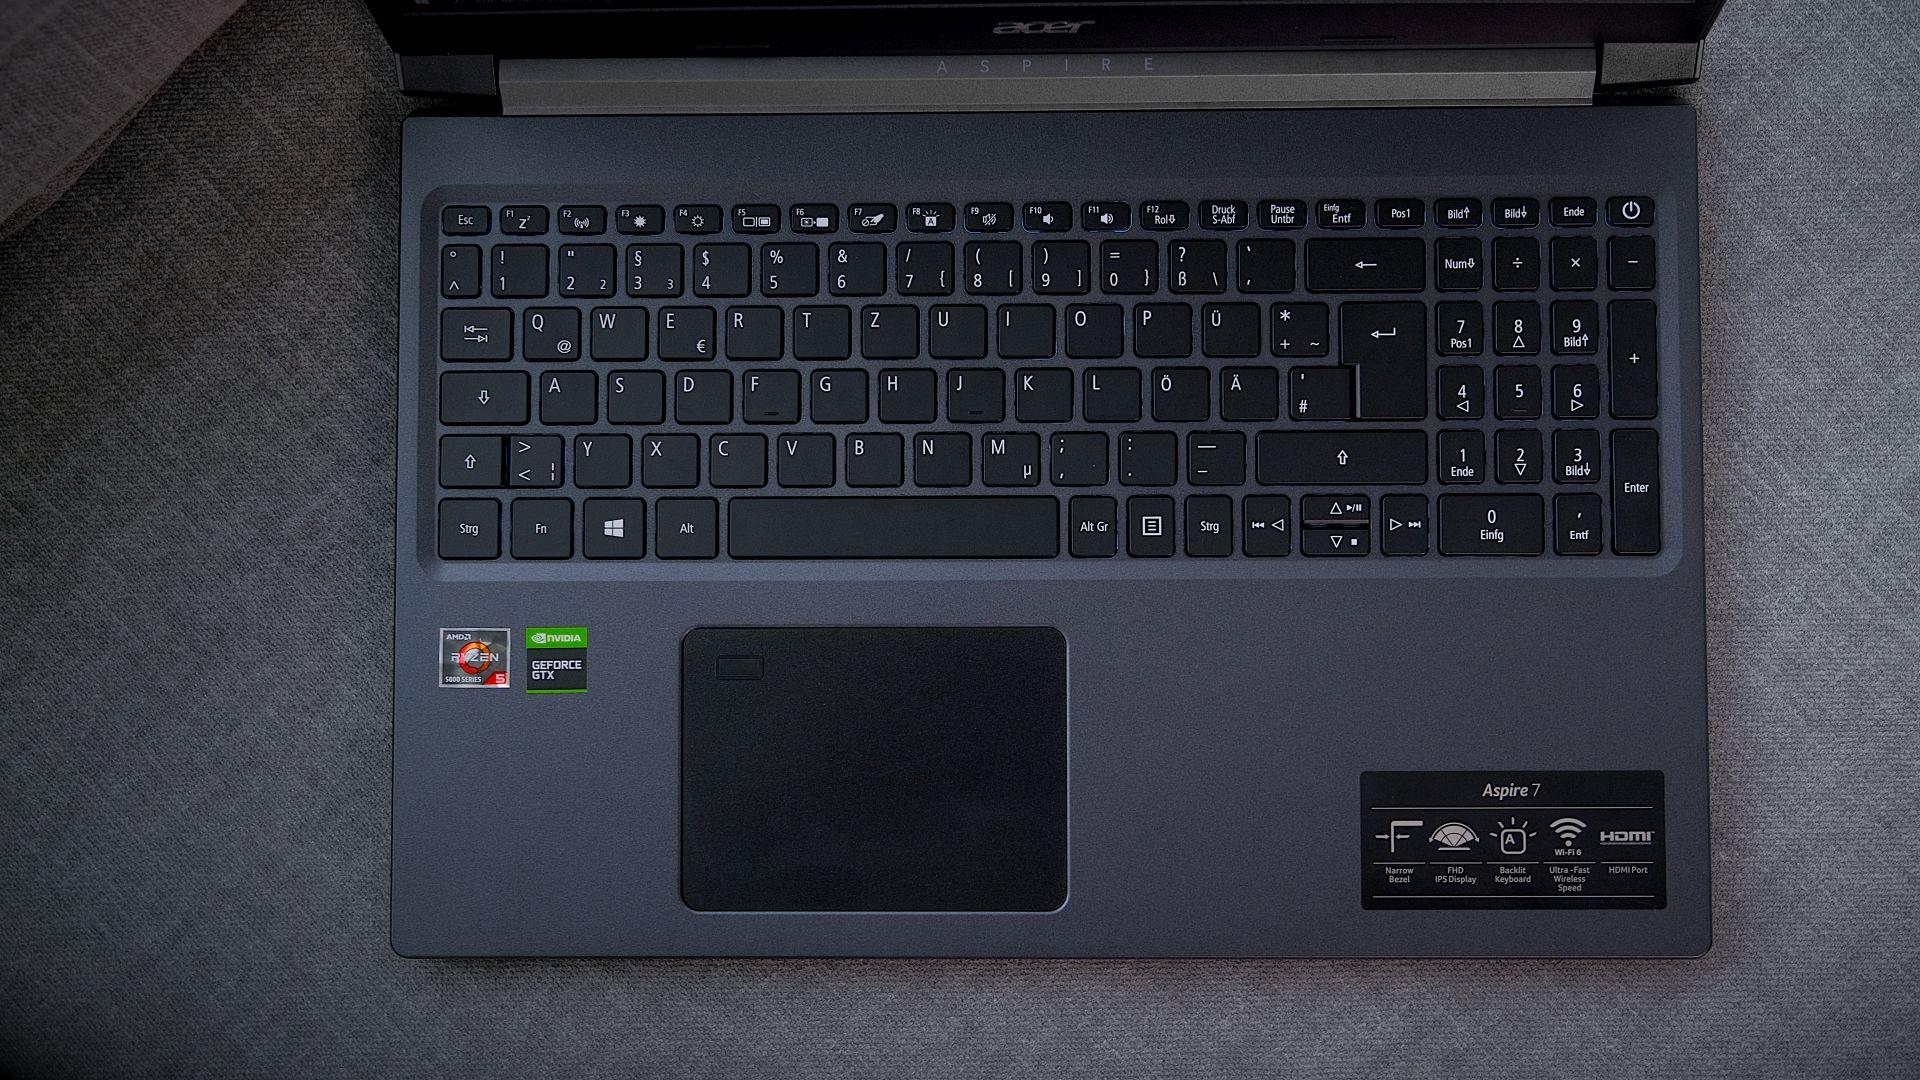 Acer Aspire 7 keys